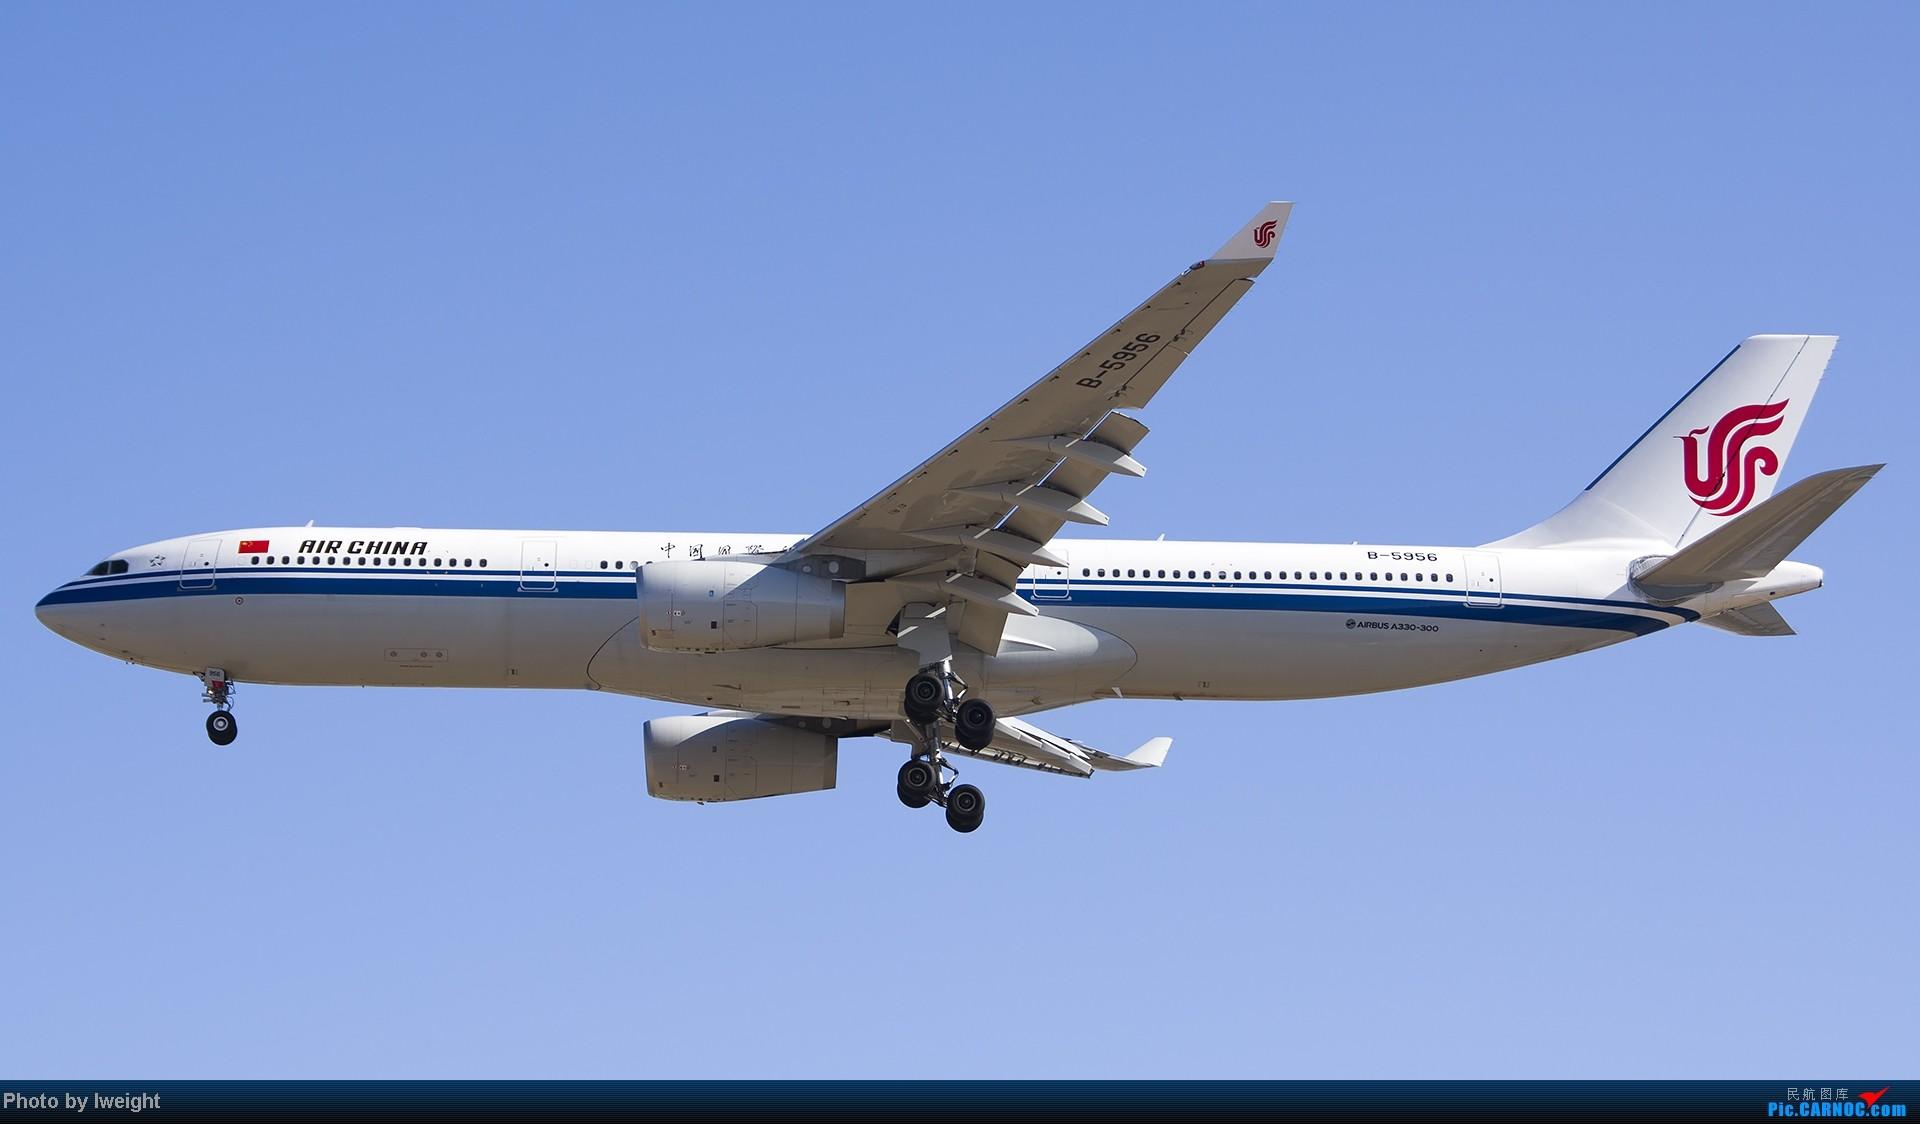 Re:[原创]抓住APEC蓝的尾巴,再拍上一组 AIRBUS A330-300 B-5956 中国北京首都机场